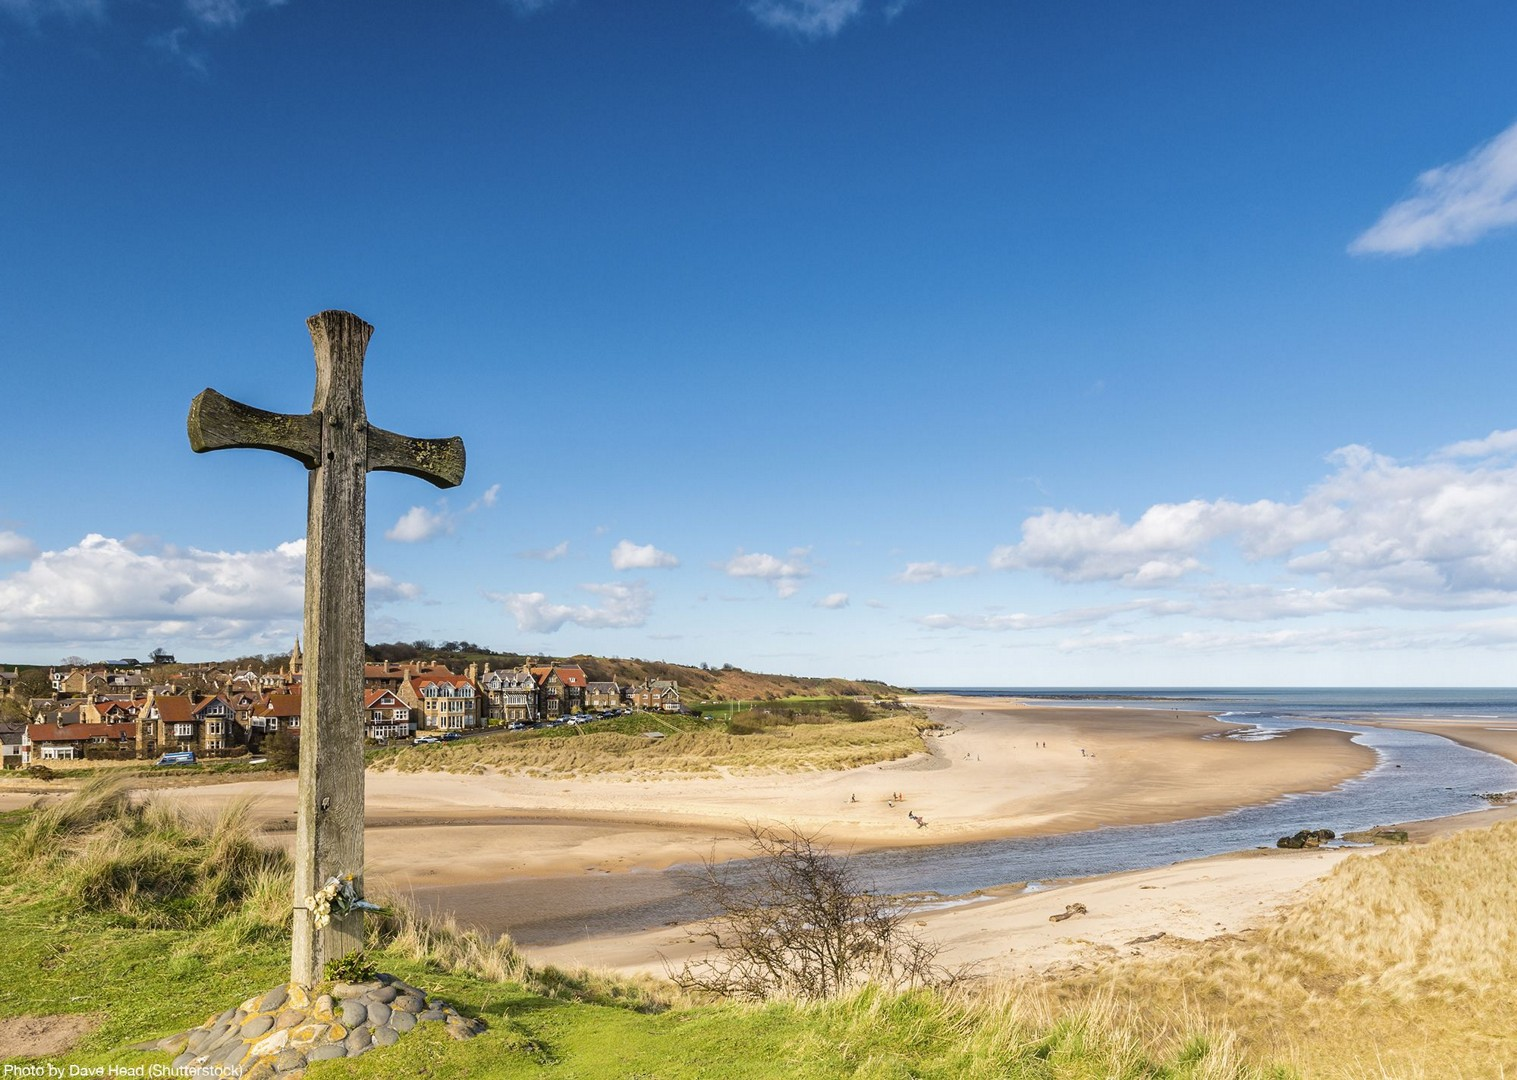 warkworth-beaches-cycling-holiday-bike-tour-self-guided-leisure-uk-england.jpg - UK - Northumberland - Alnmouth - Self-Guided Leisure Cycling Holiday - Leisure Cycling